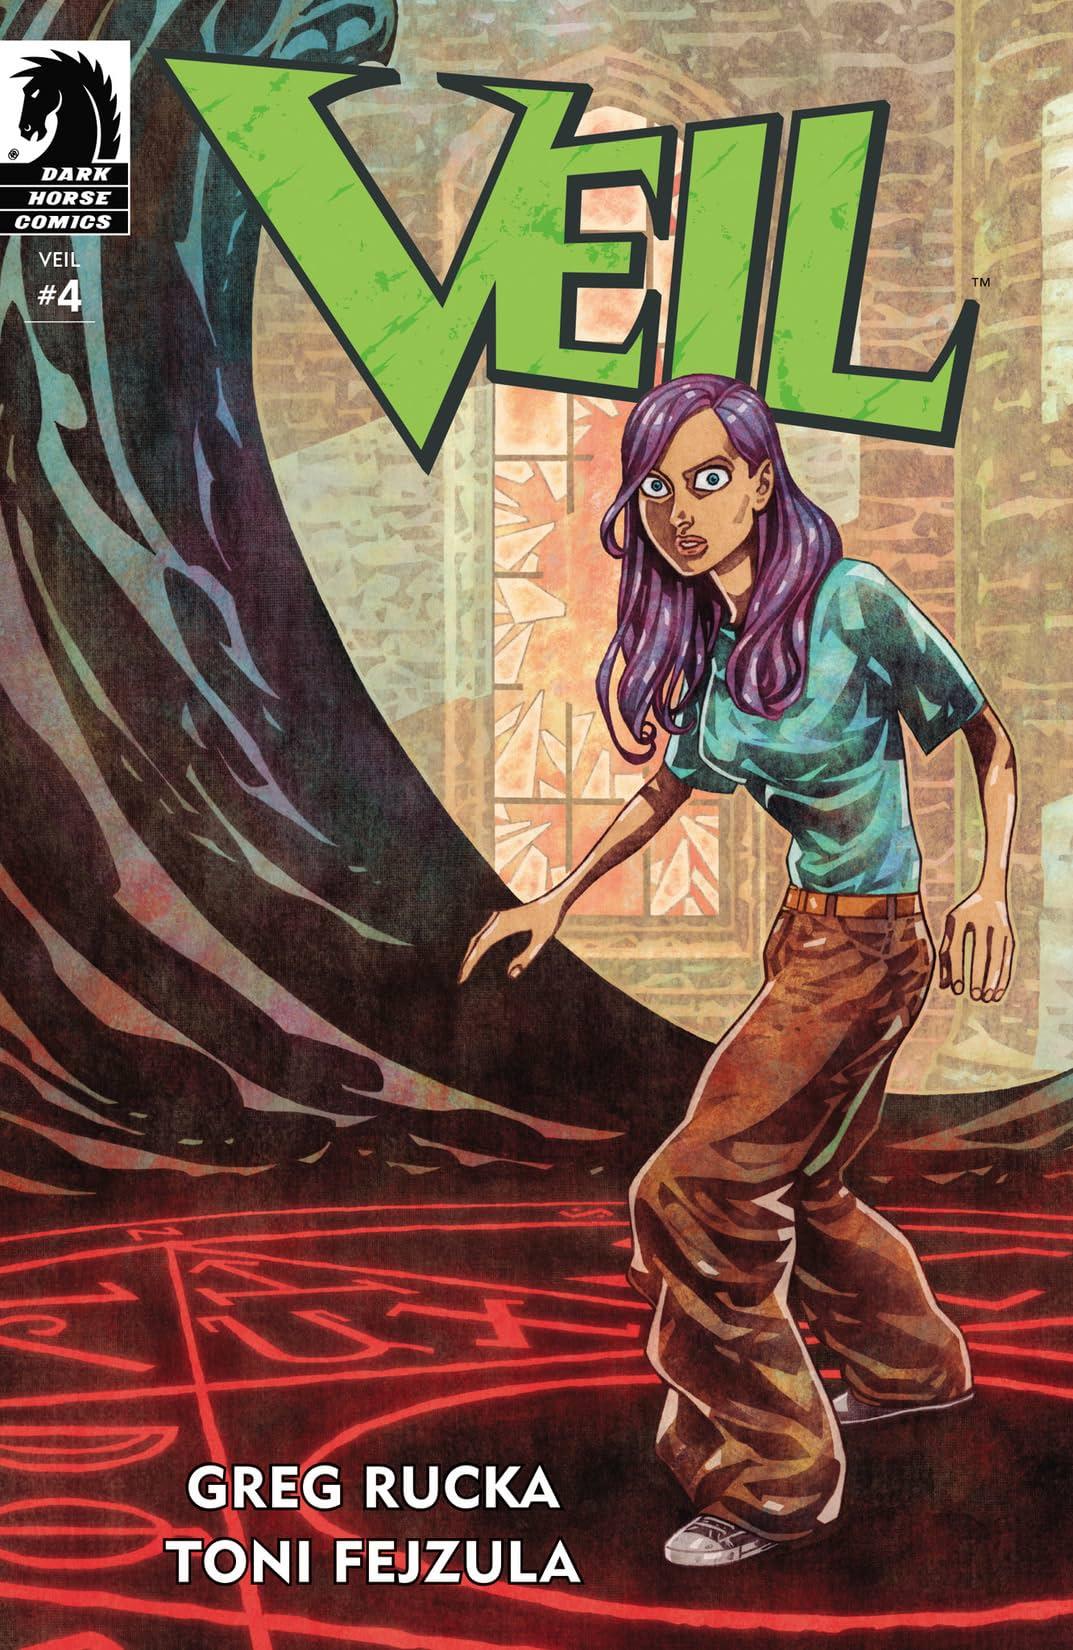 Veil #4